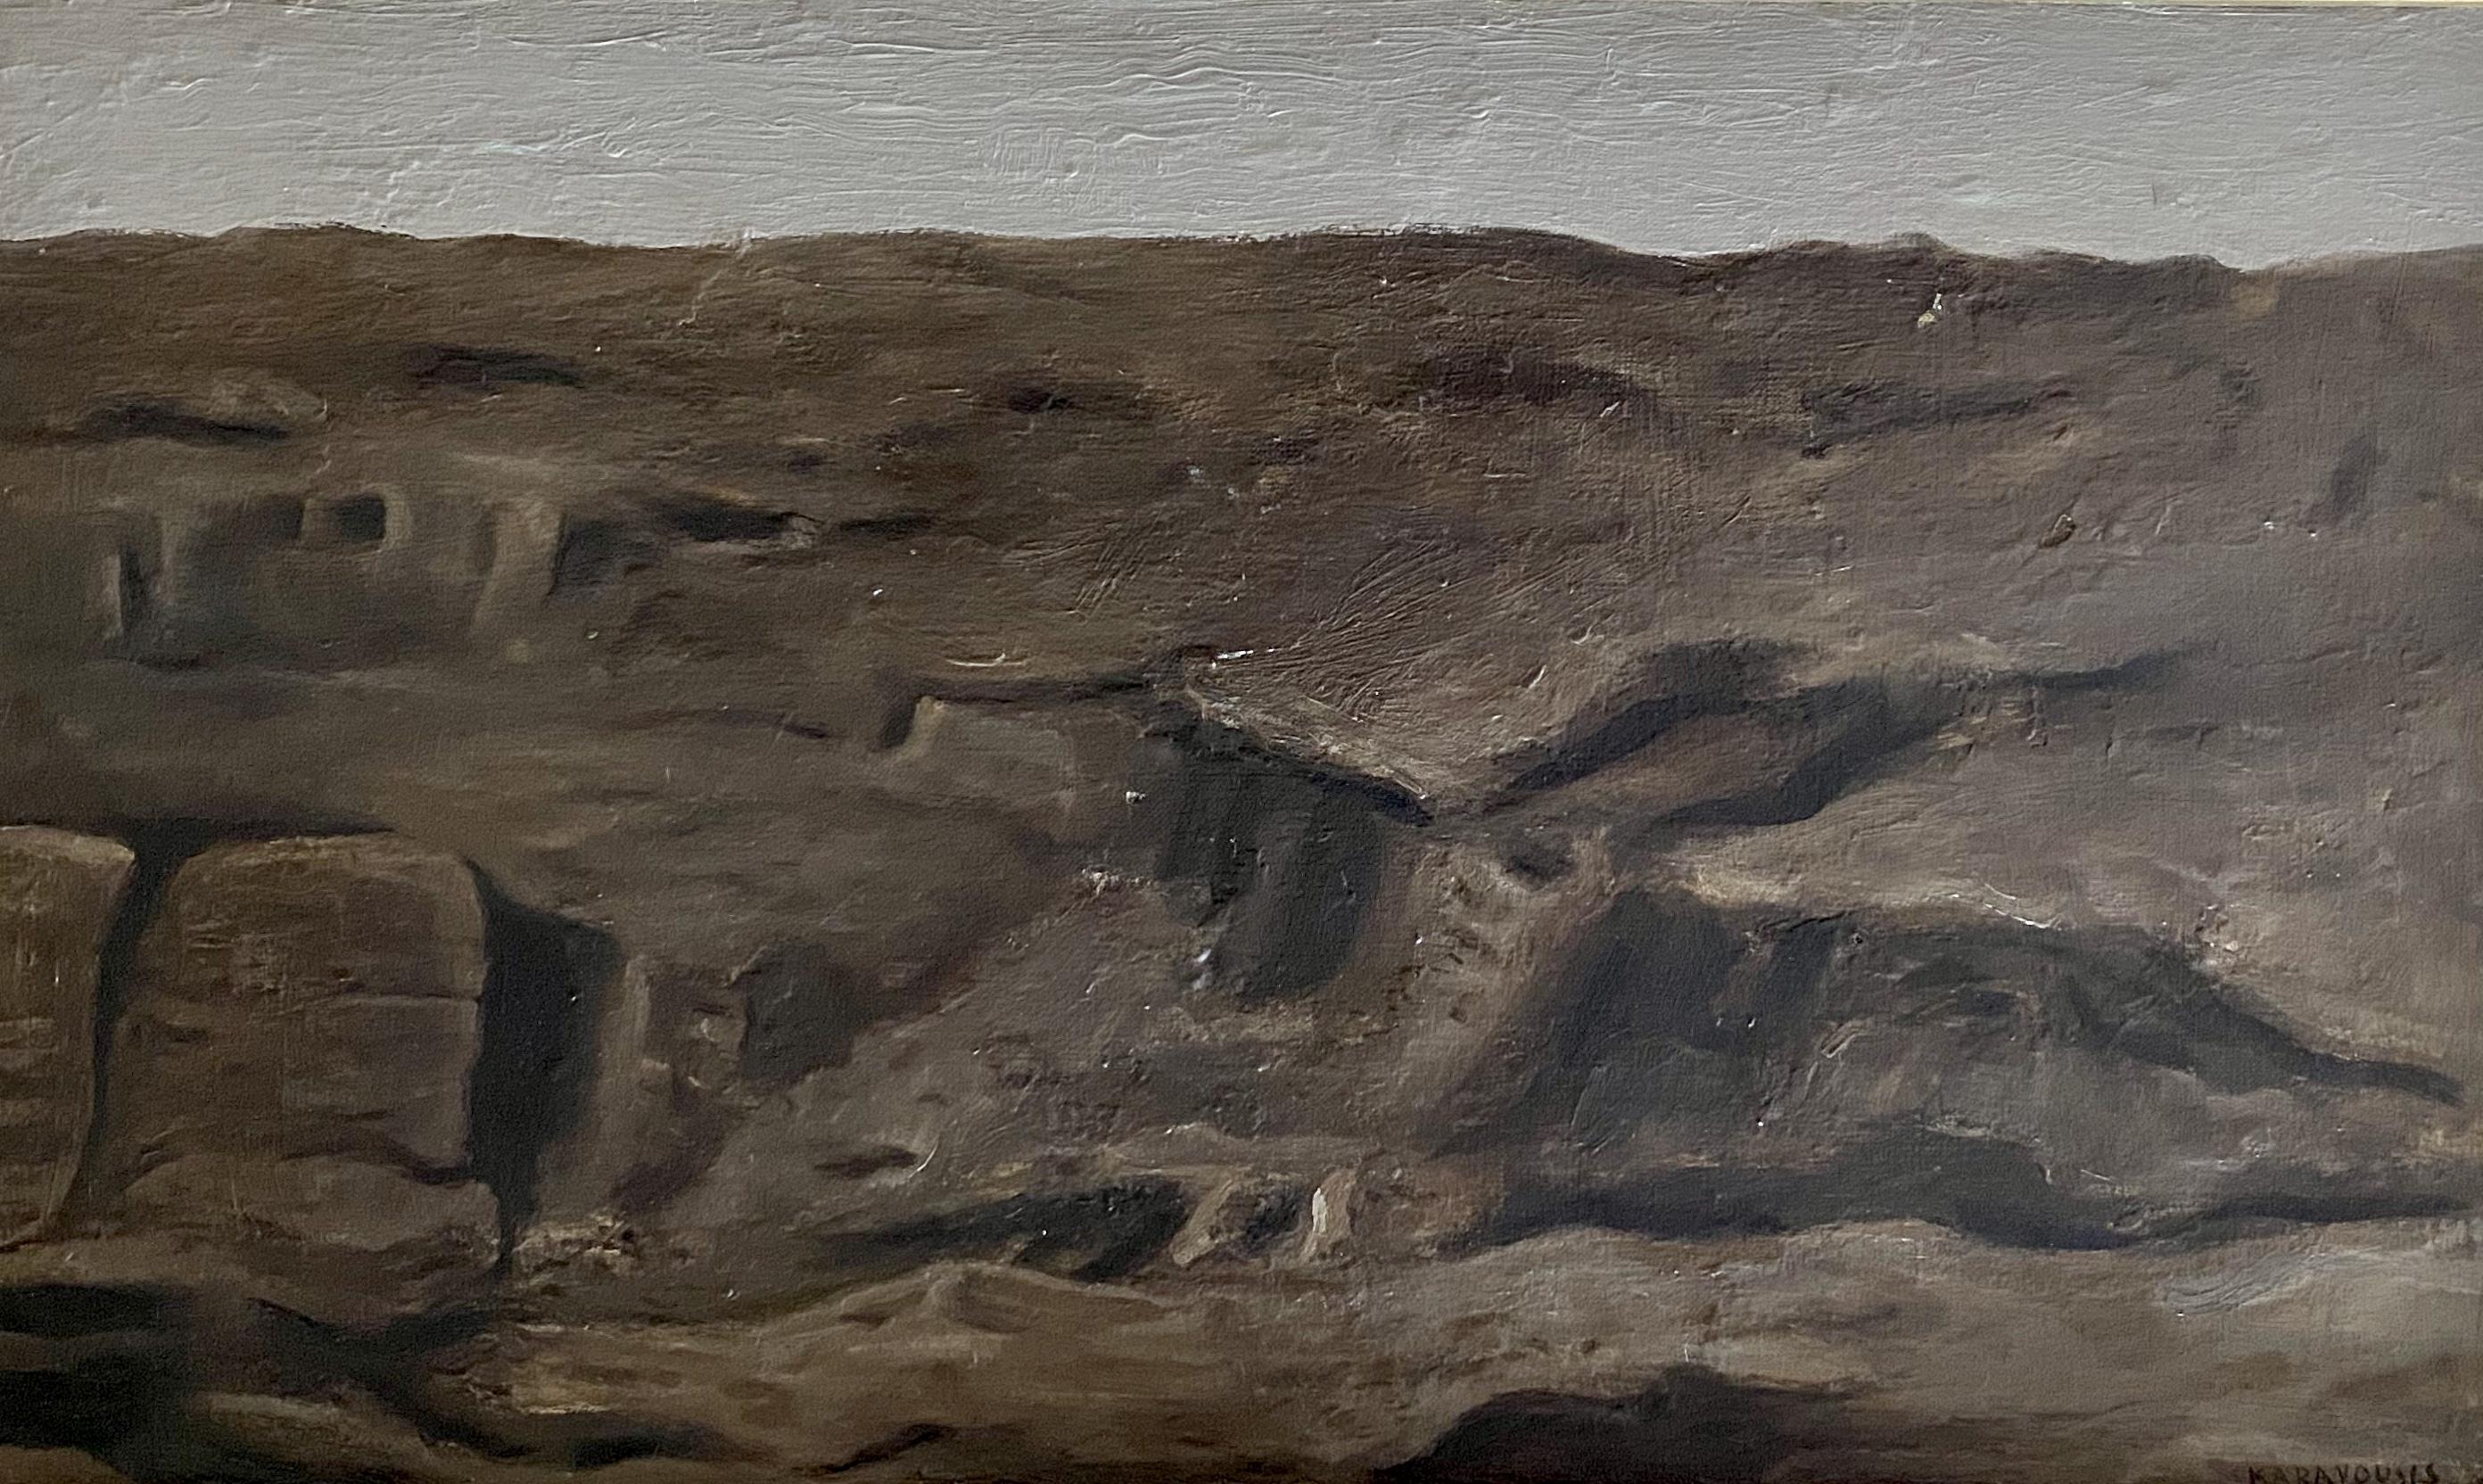 Sarantis Karavouzis (Greek, 1938-2011) (AR), Landscape, oil on canvas, 45 x 26 cm